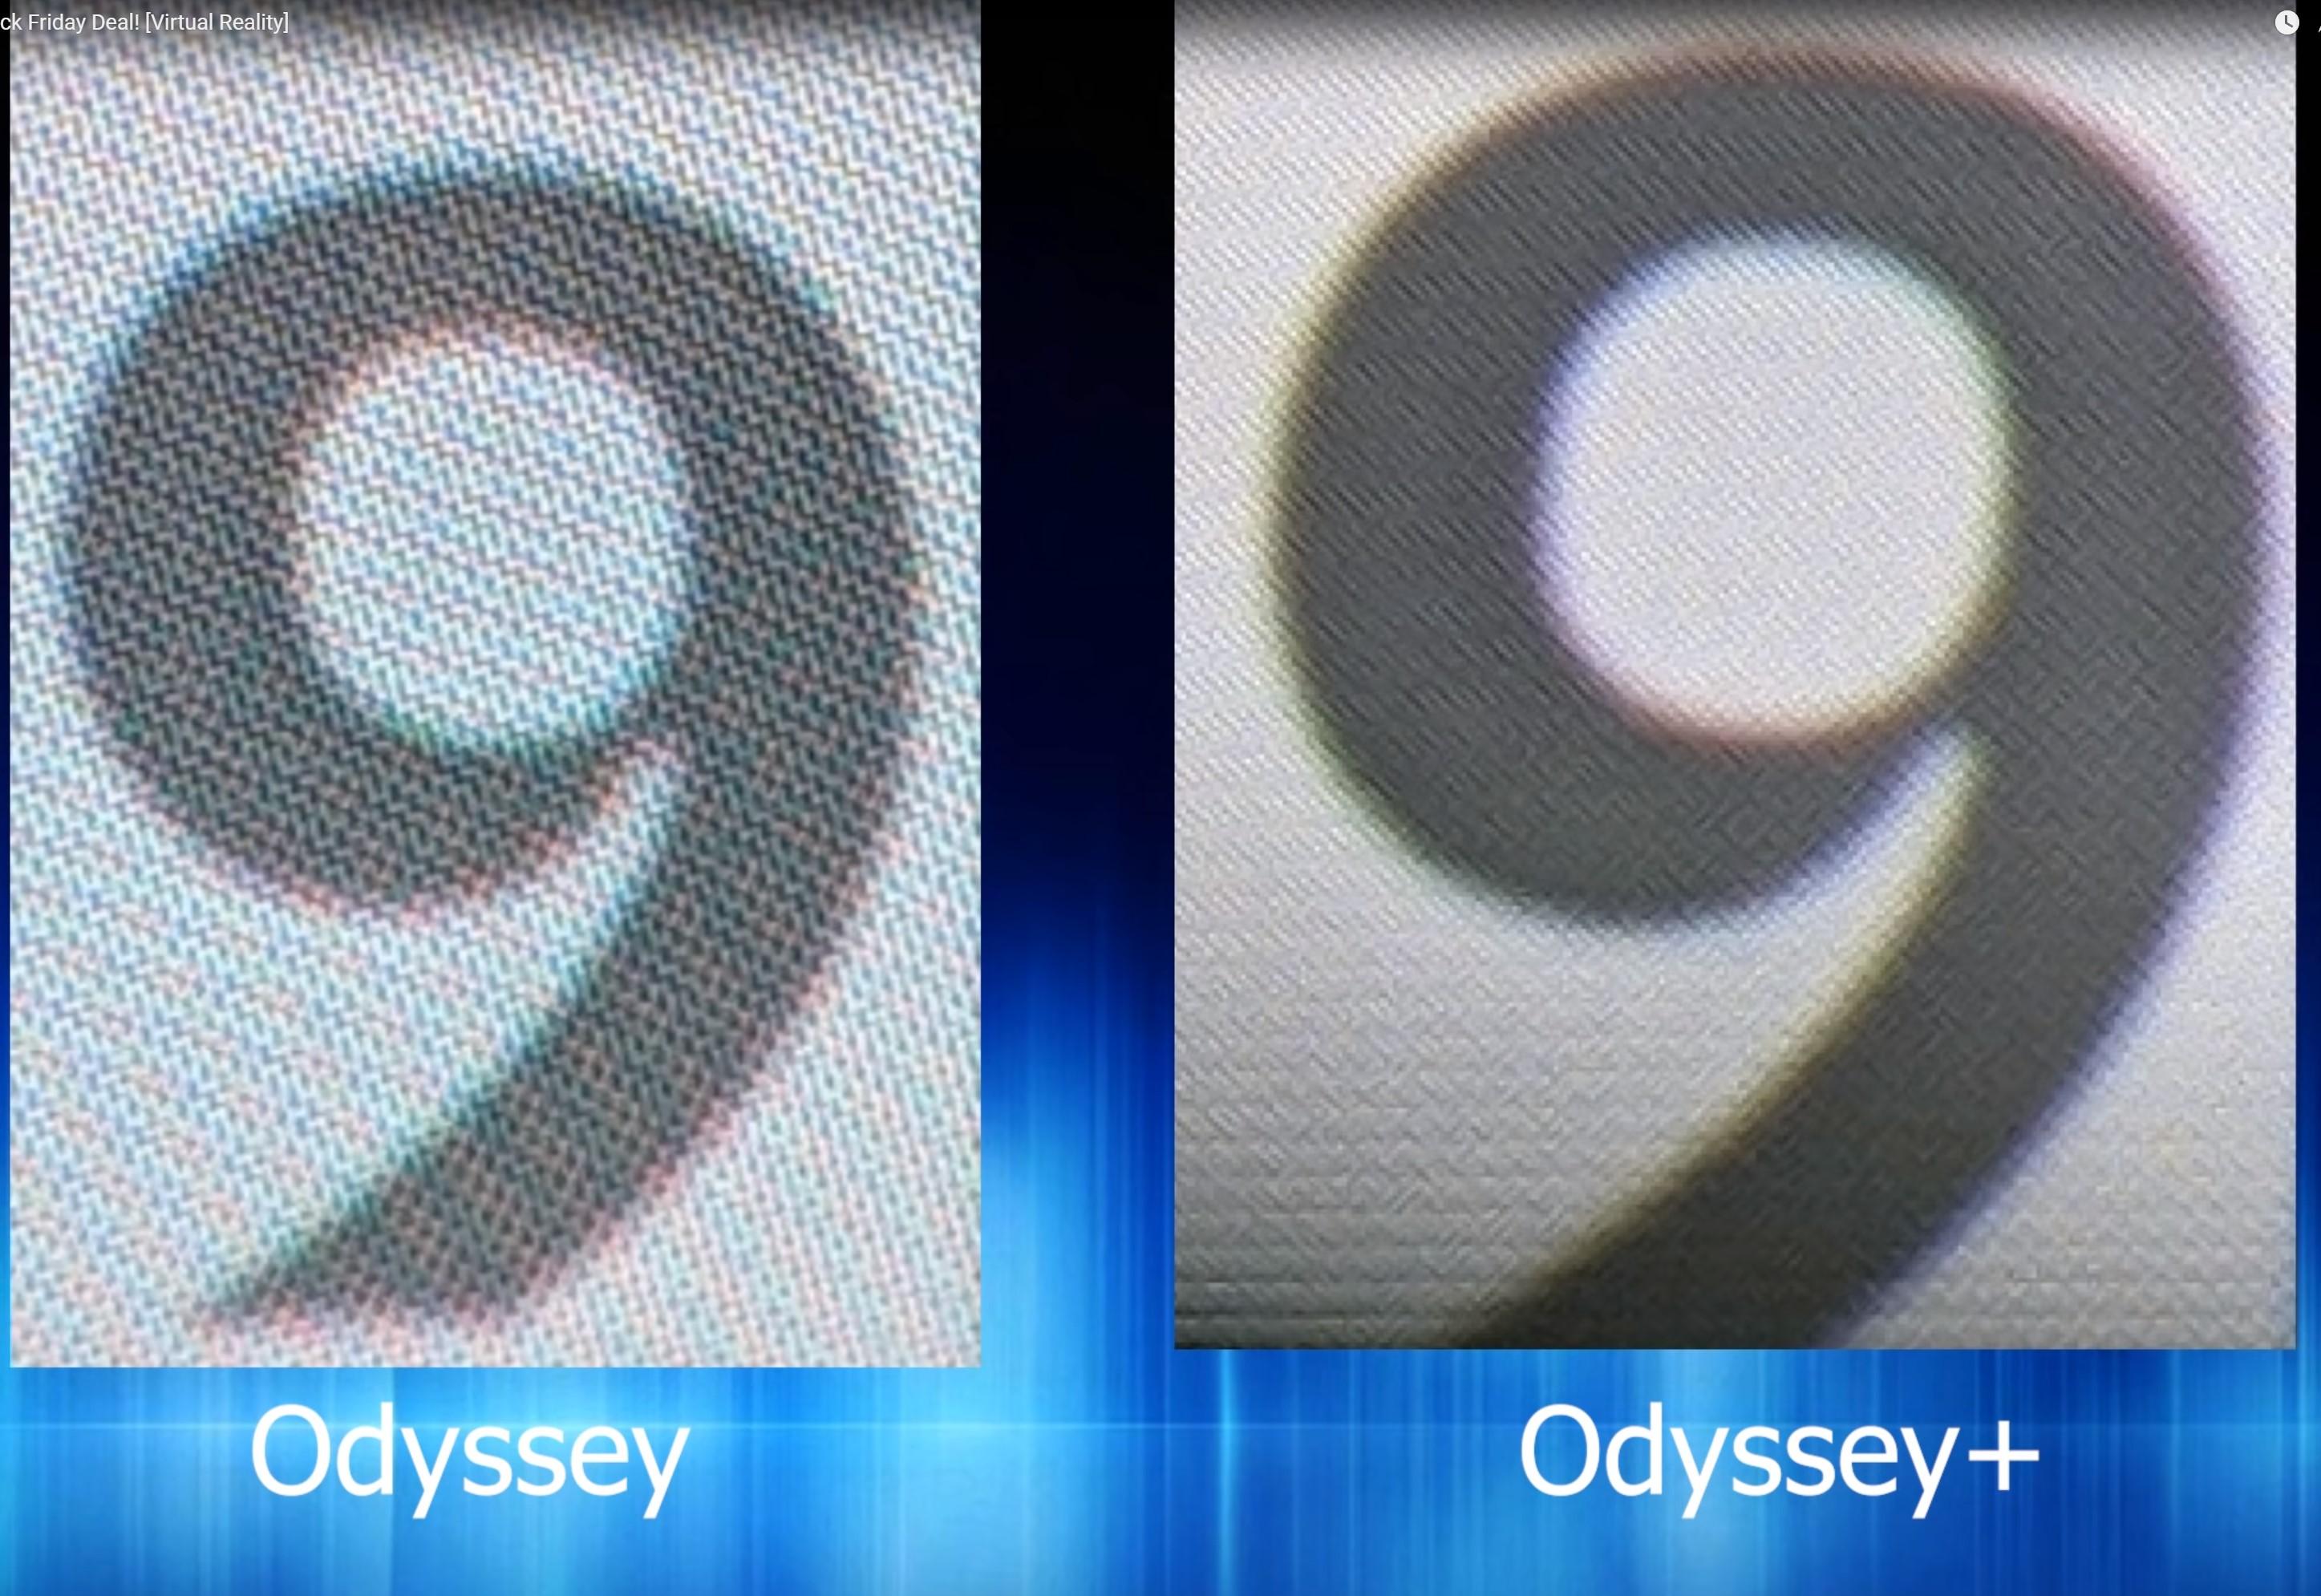 Samsung Odyssey Steamvr Supersampling